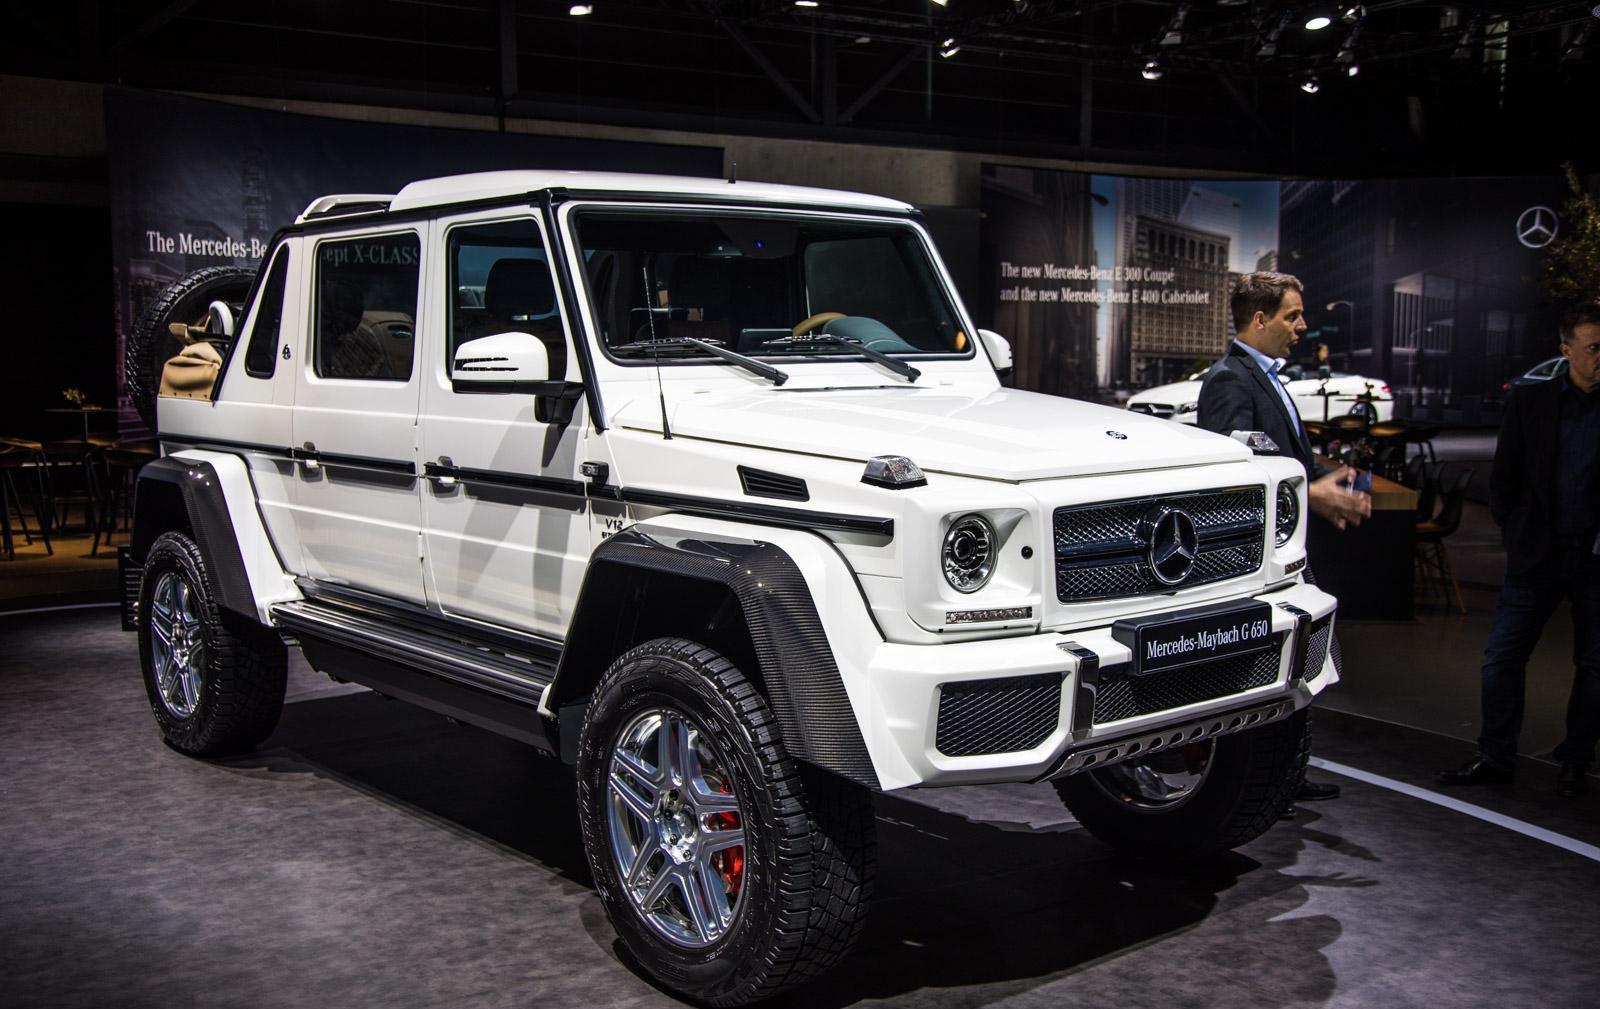 Mercedes_Maybach_G_650_Landaulet_001